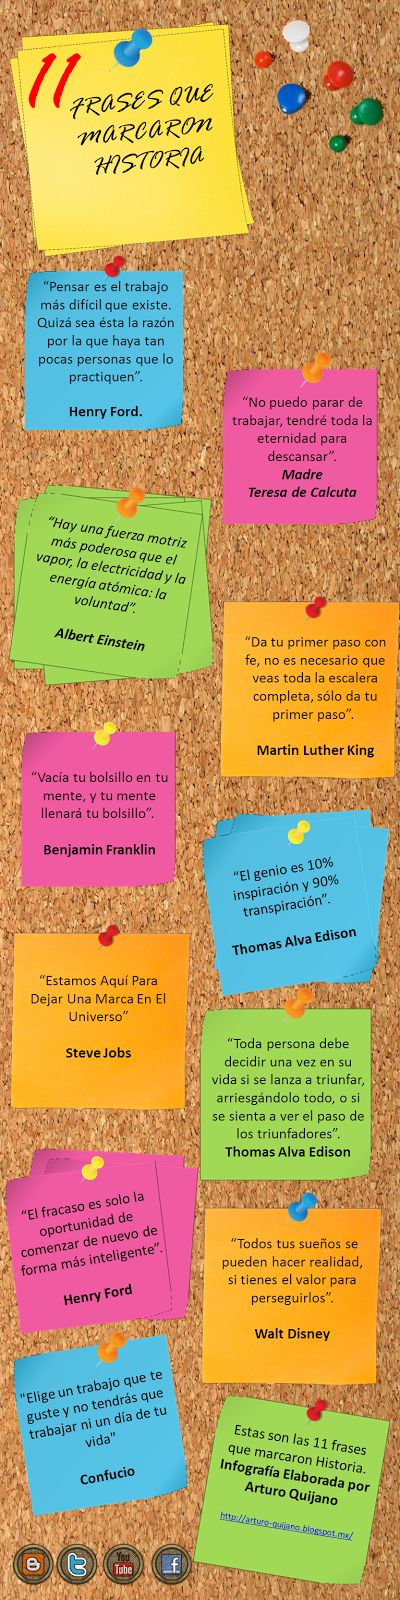 11 frases que hicieron historia #infografia